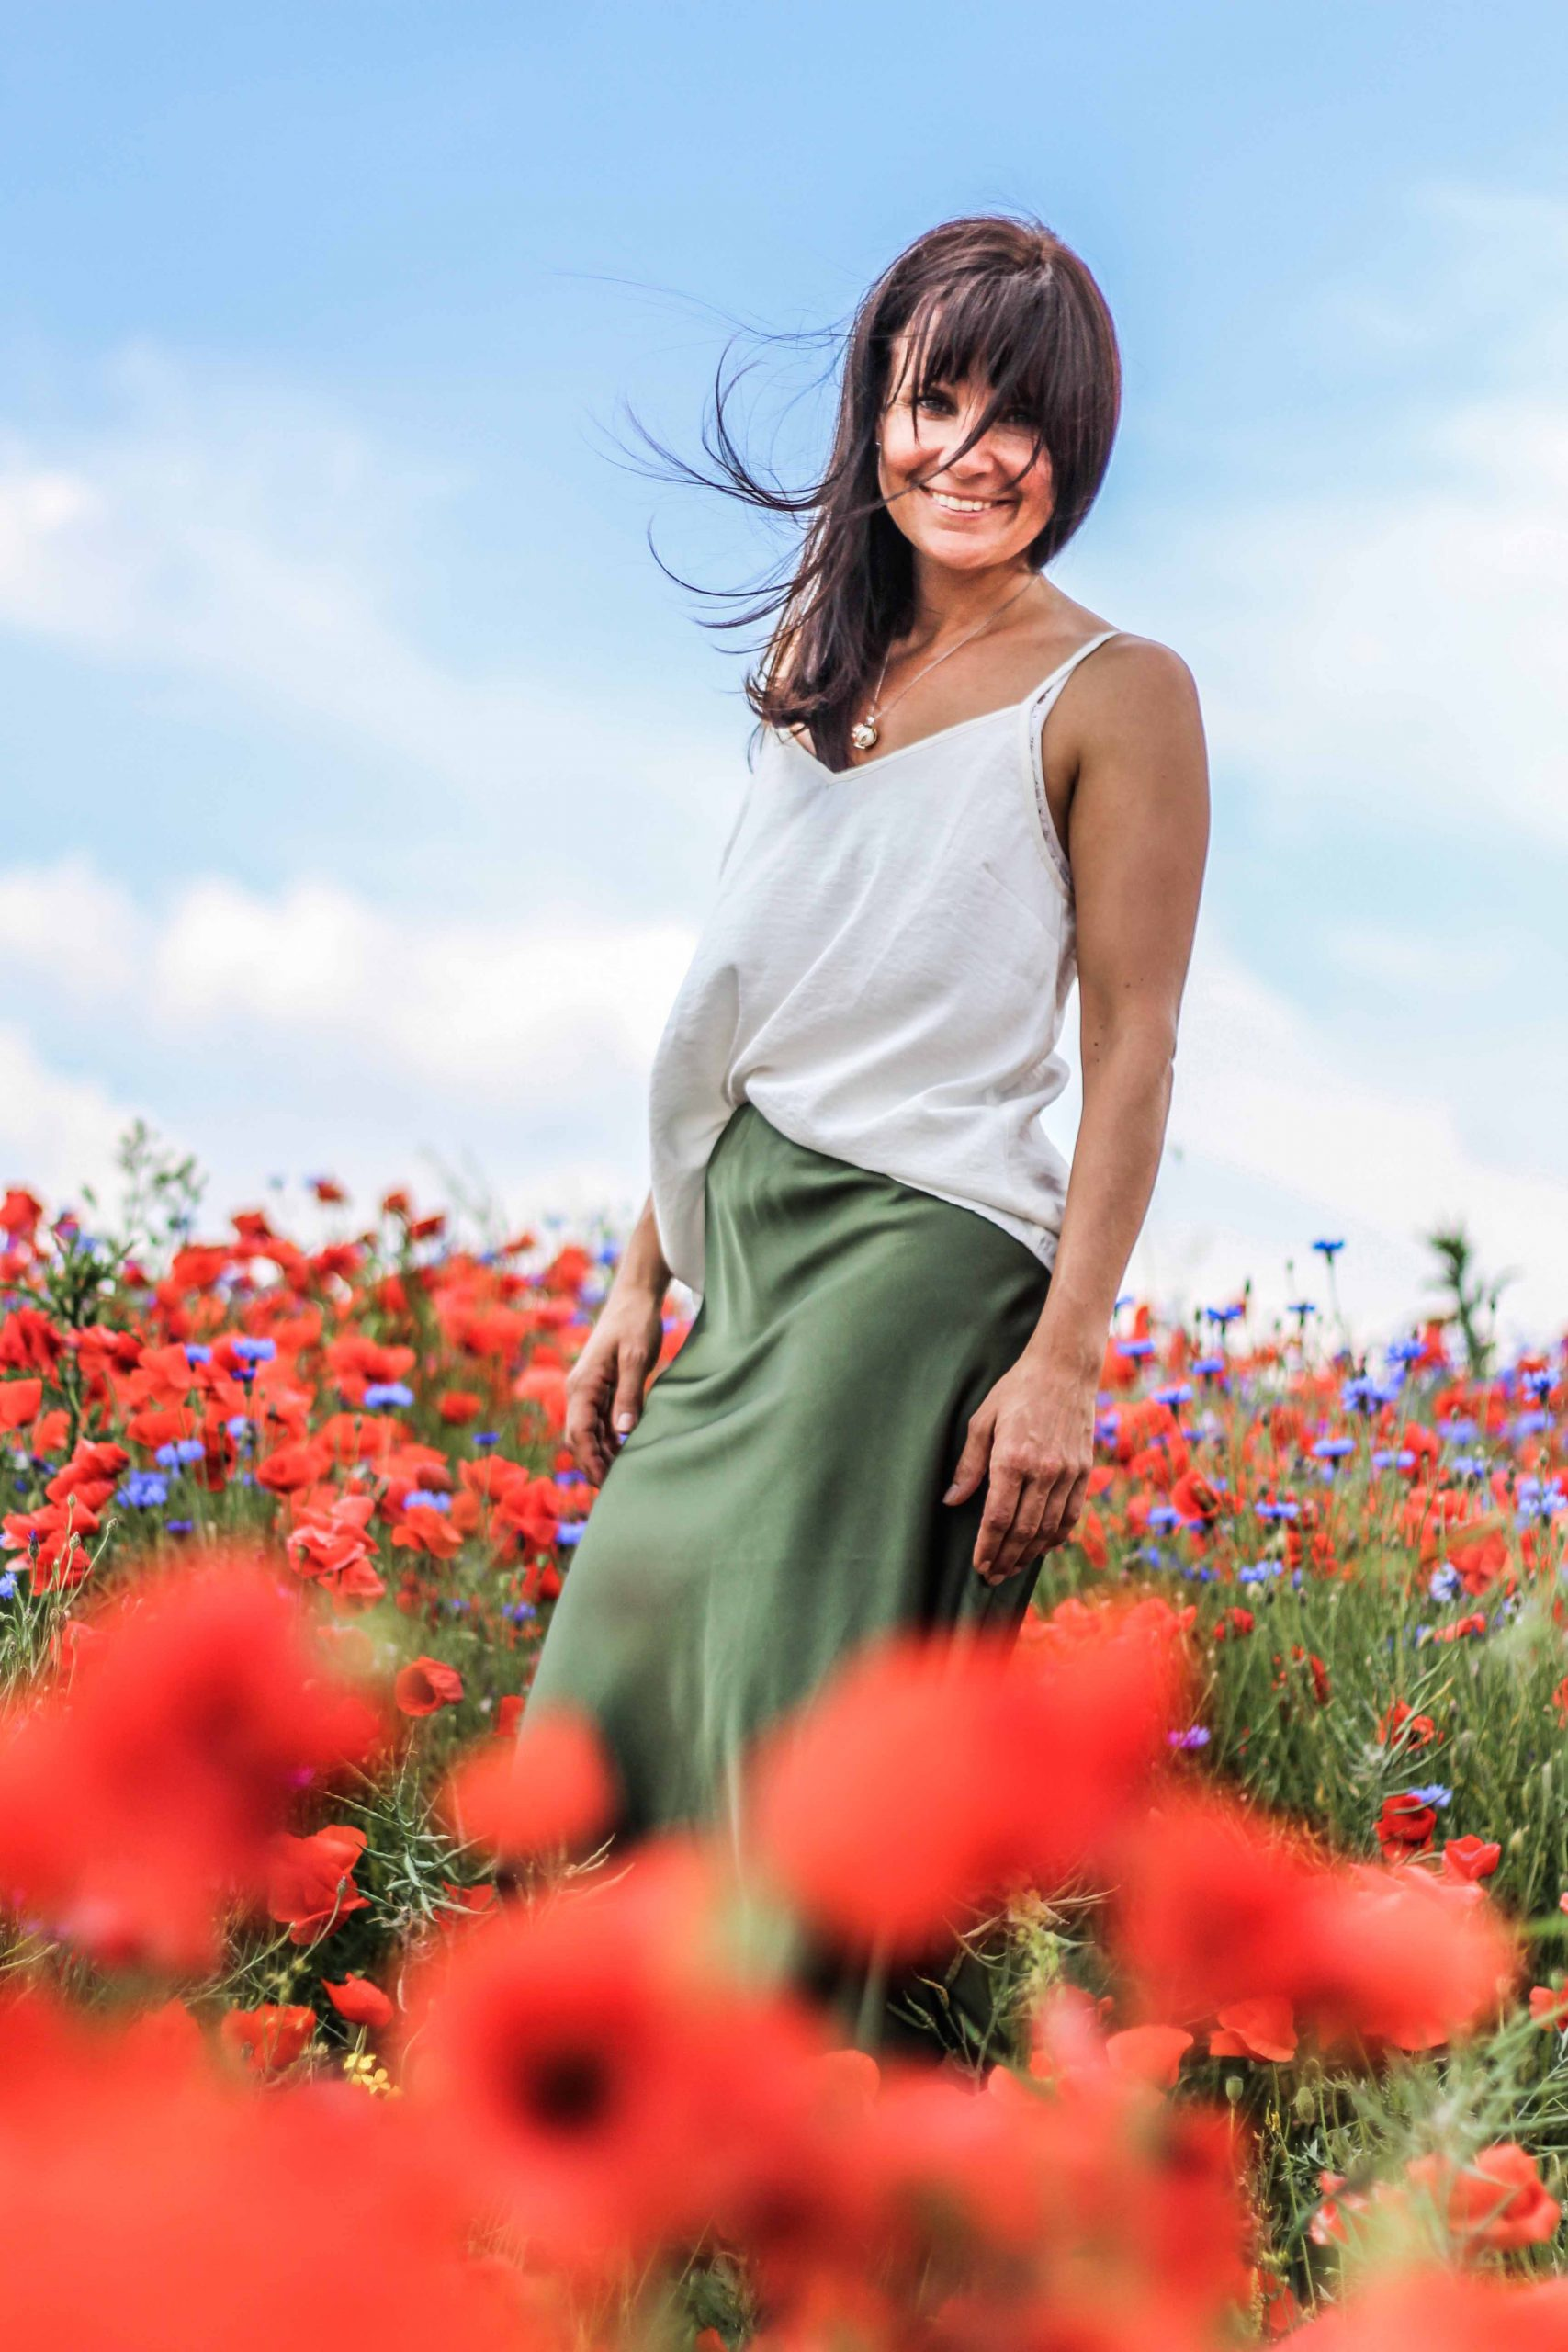 Andrea Conrad, deine Begleiterin, in einem roten Mohnfeld